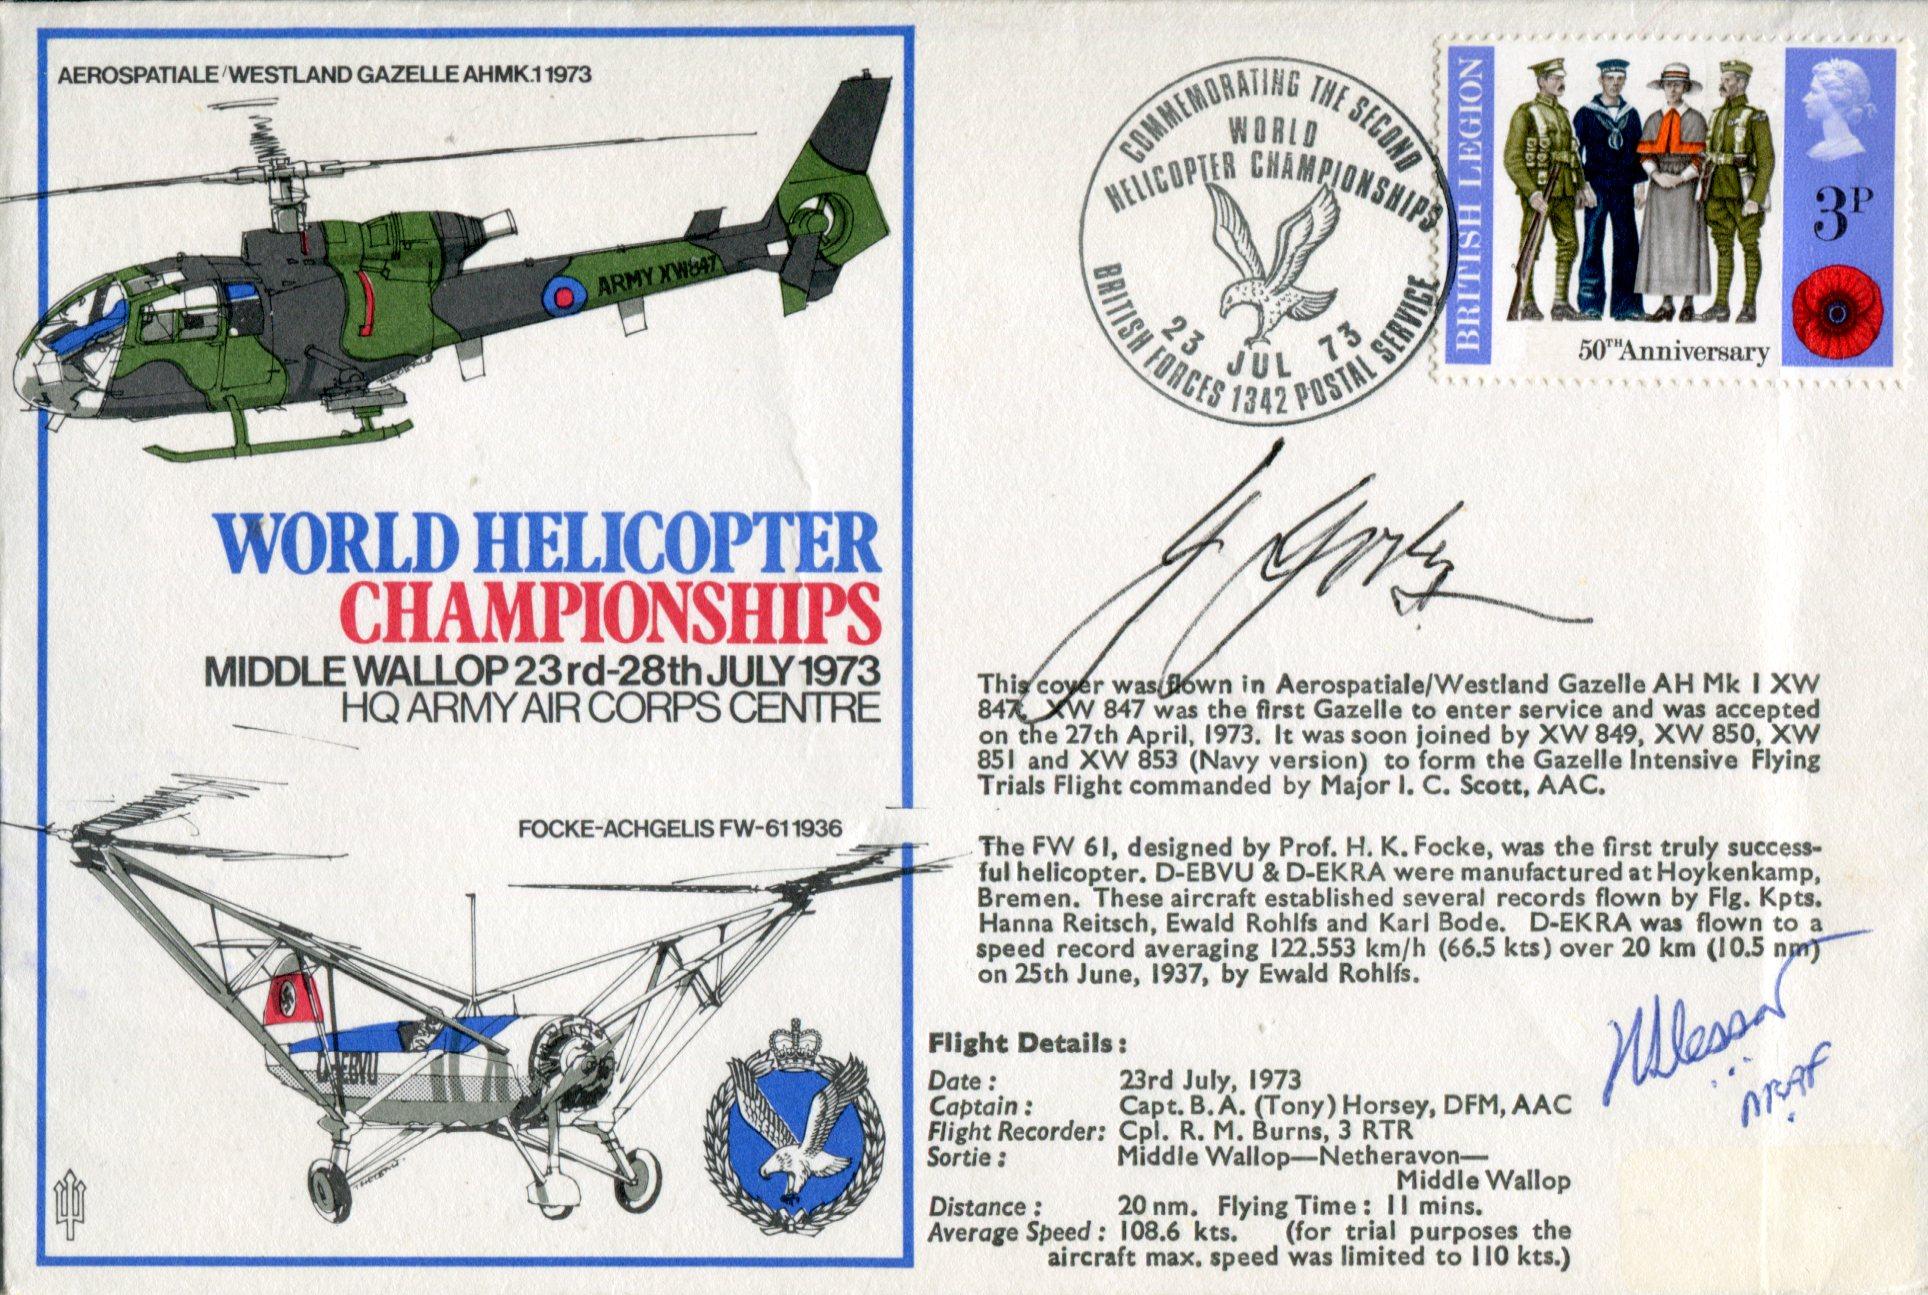 Lot 28 - Henrich Focke World Helicopter Championships cover signed by Henrich Focke, founder and designer for